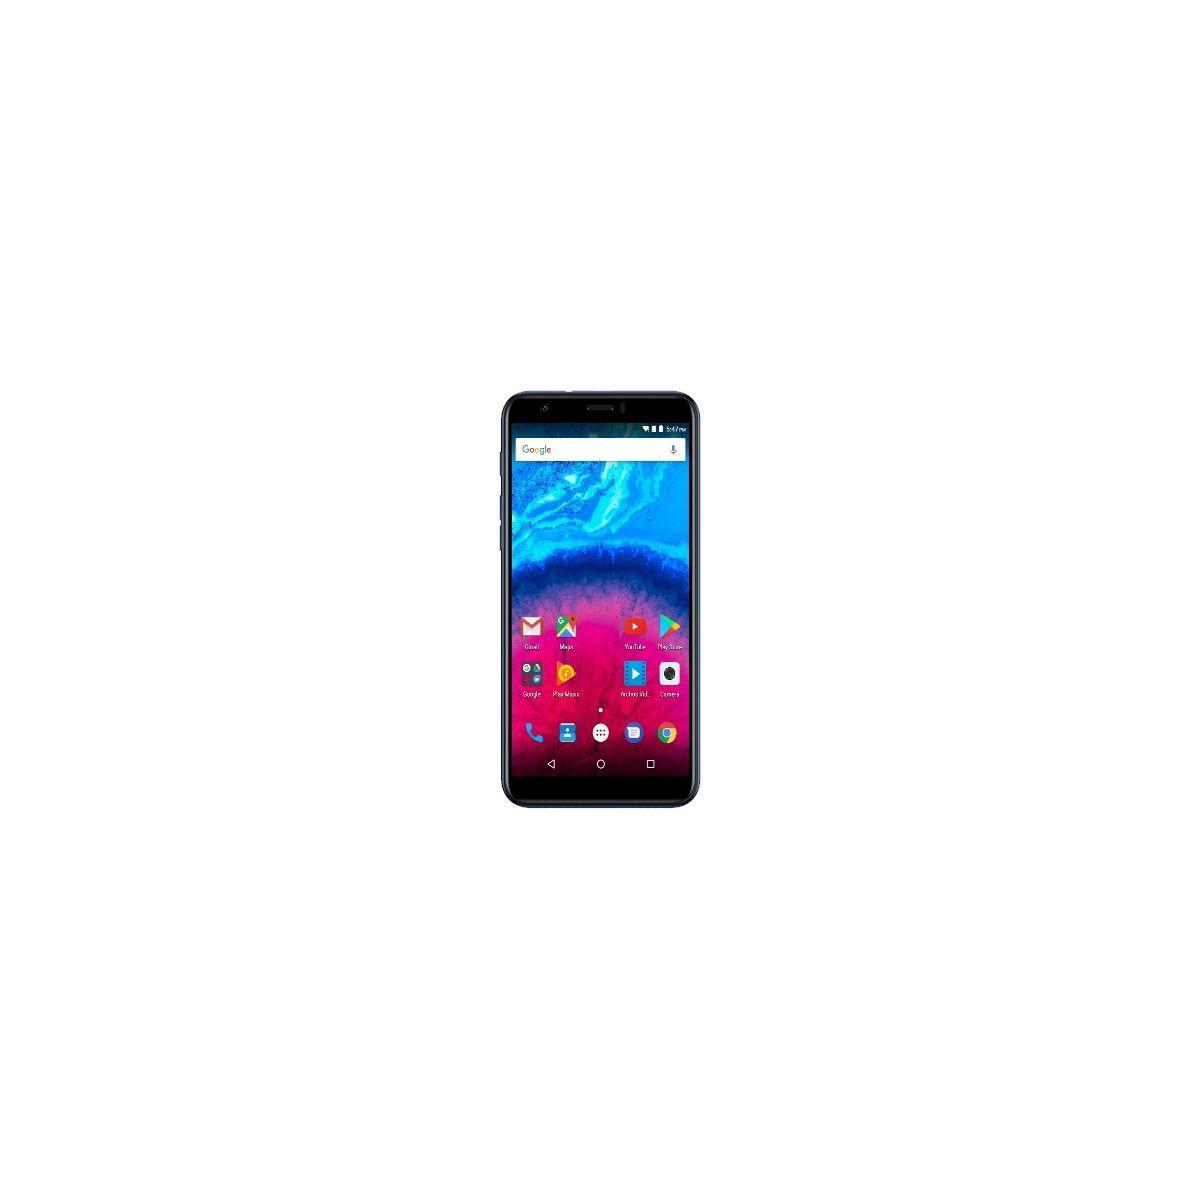 Smartphone archos core 60s 16go borderless